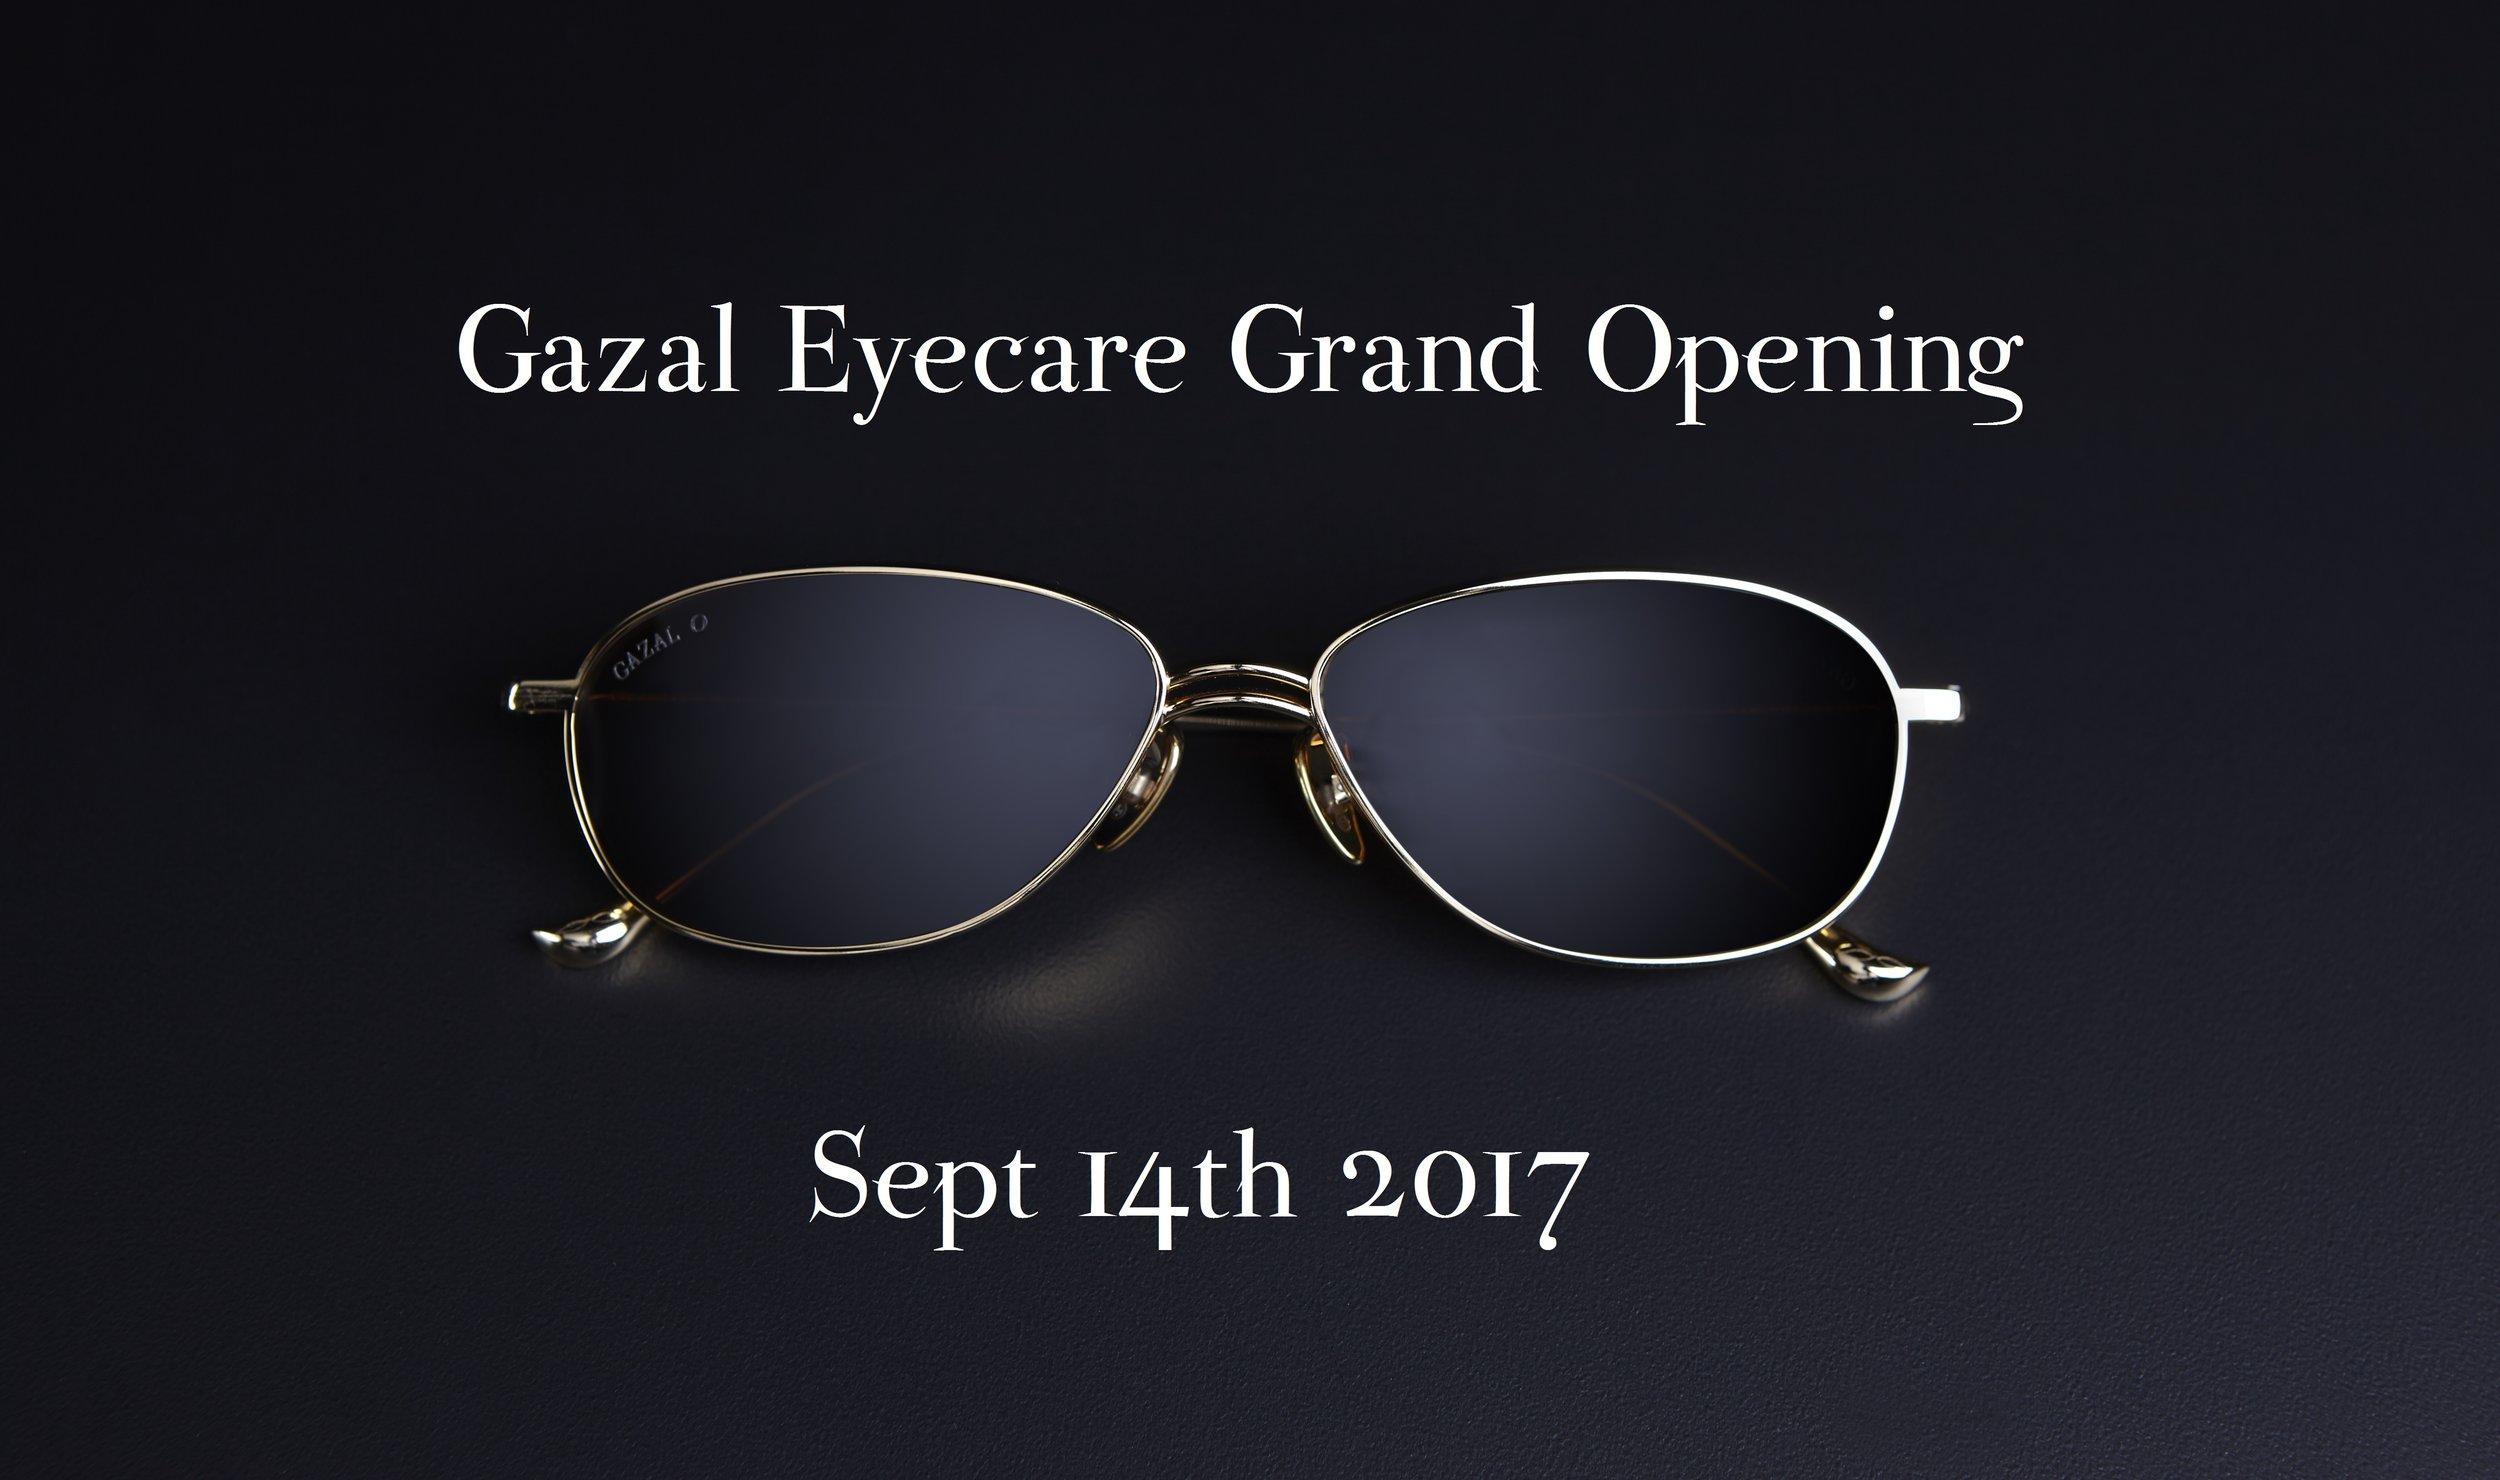 grandopening_gazal_eyecare